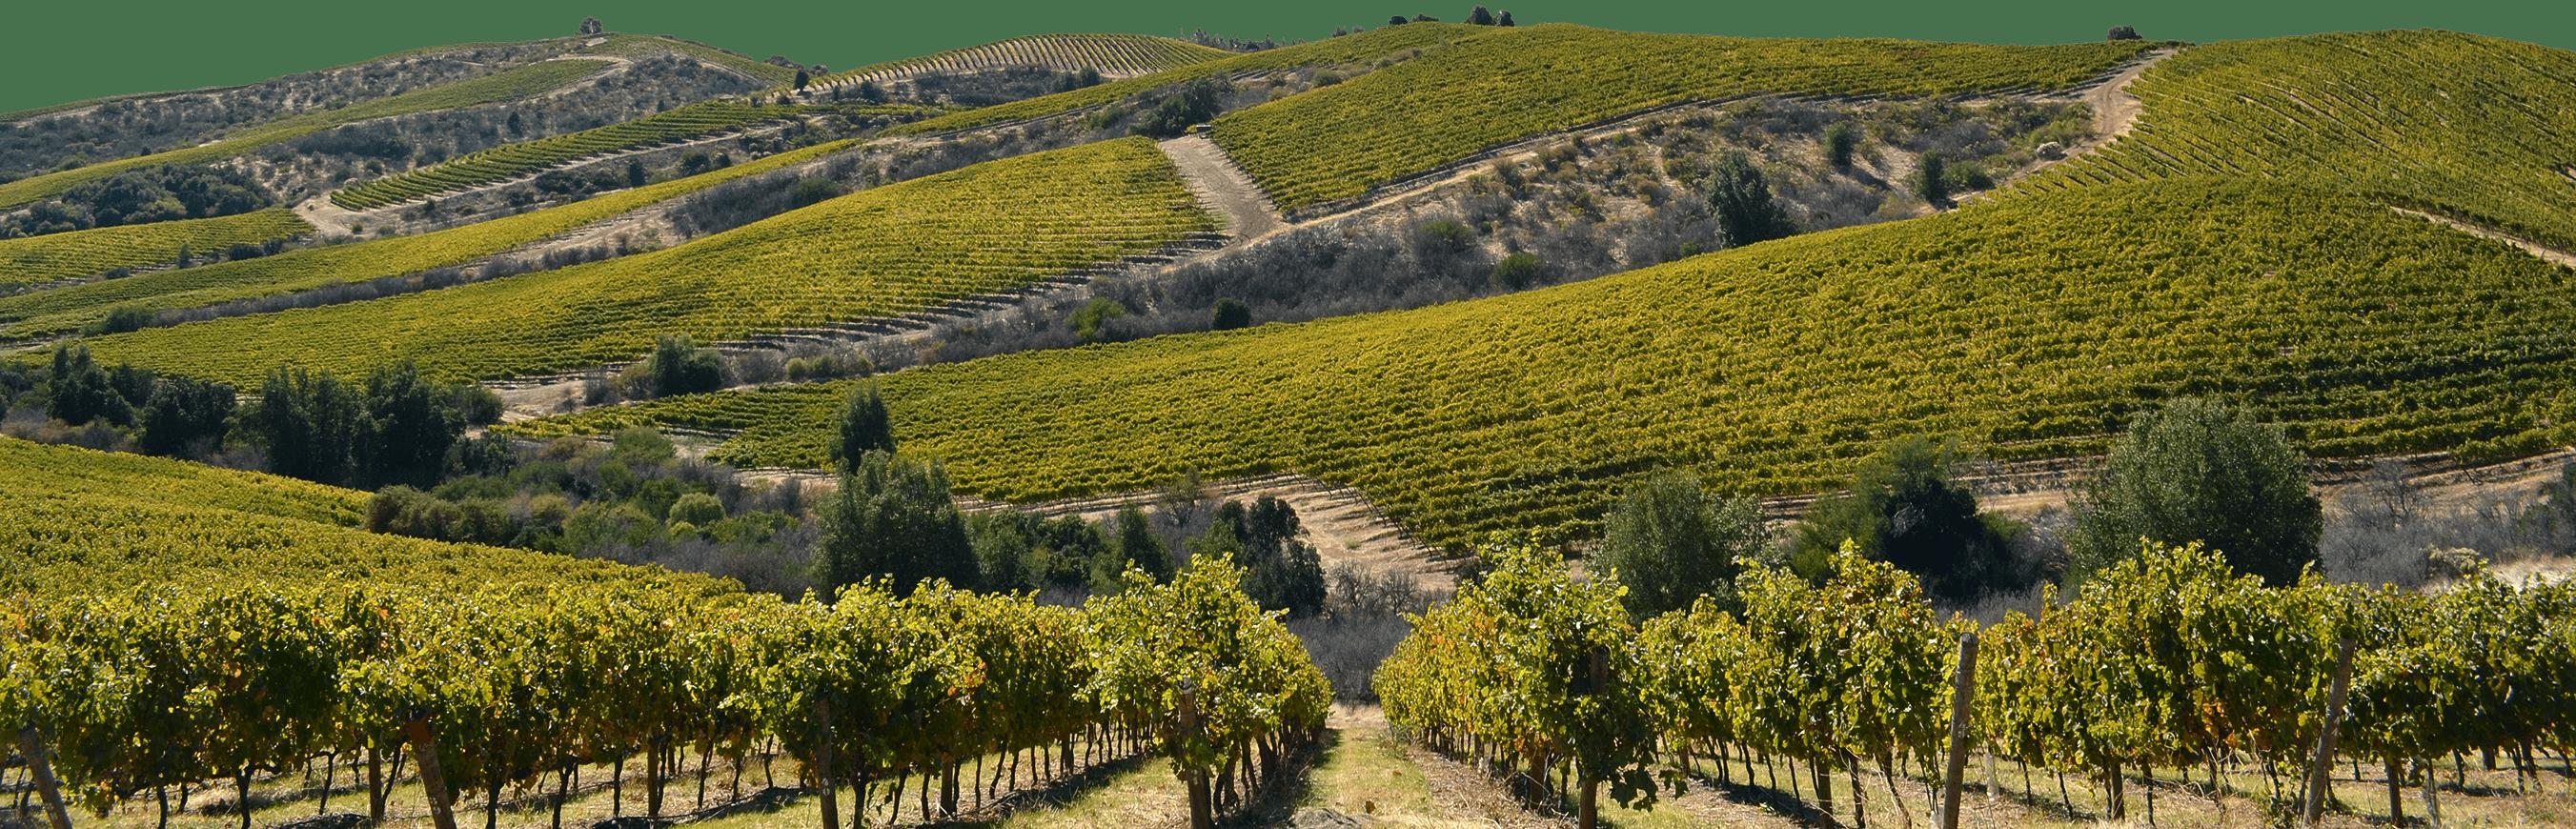 Concha Y Toro Mountain Range